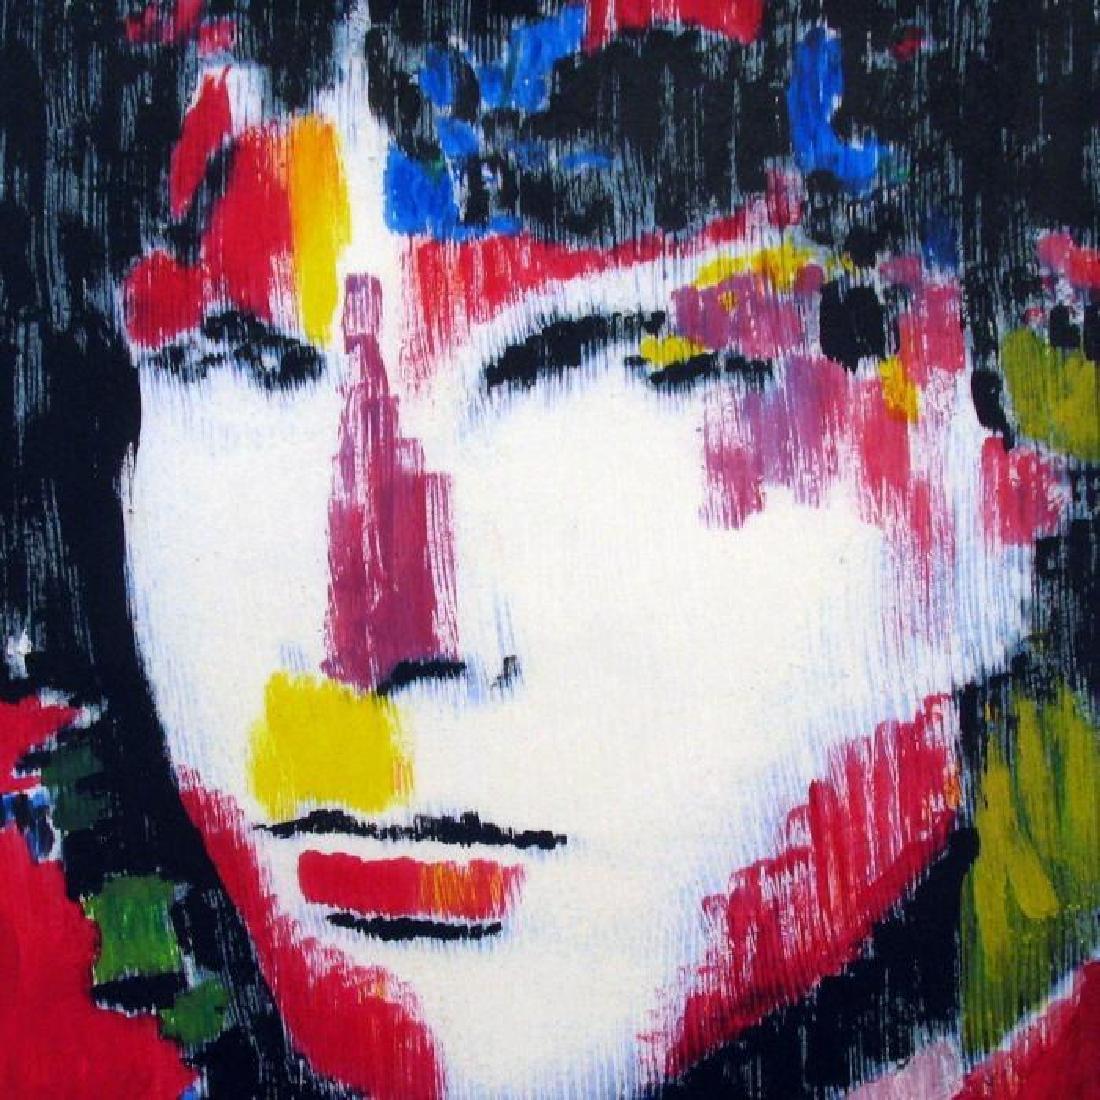 Jim Morrison Signed Limited Edition Pop Ap Giclee Sale - 3